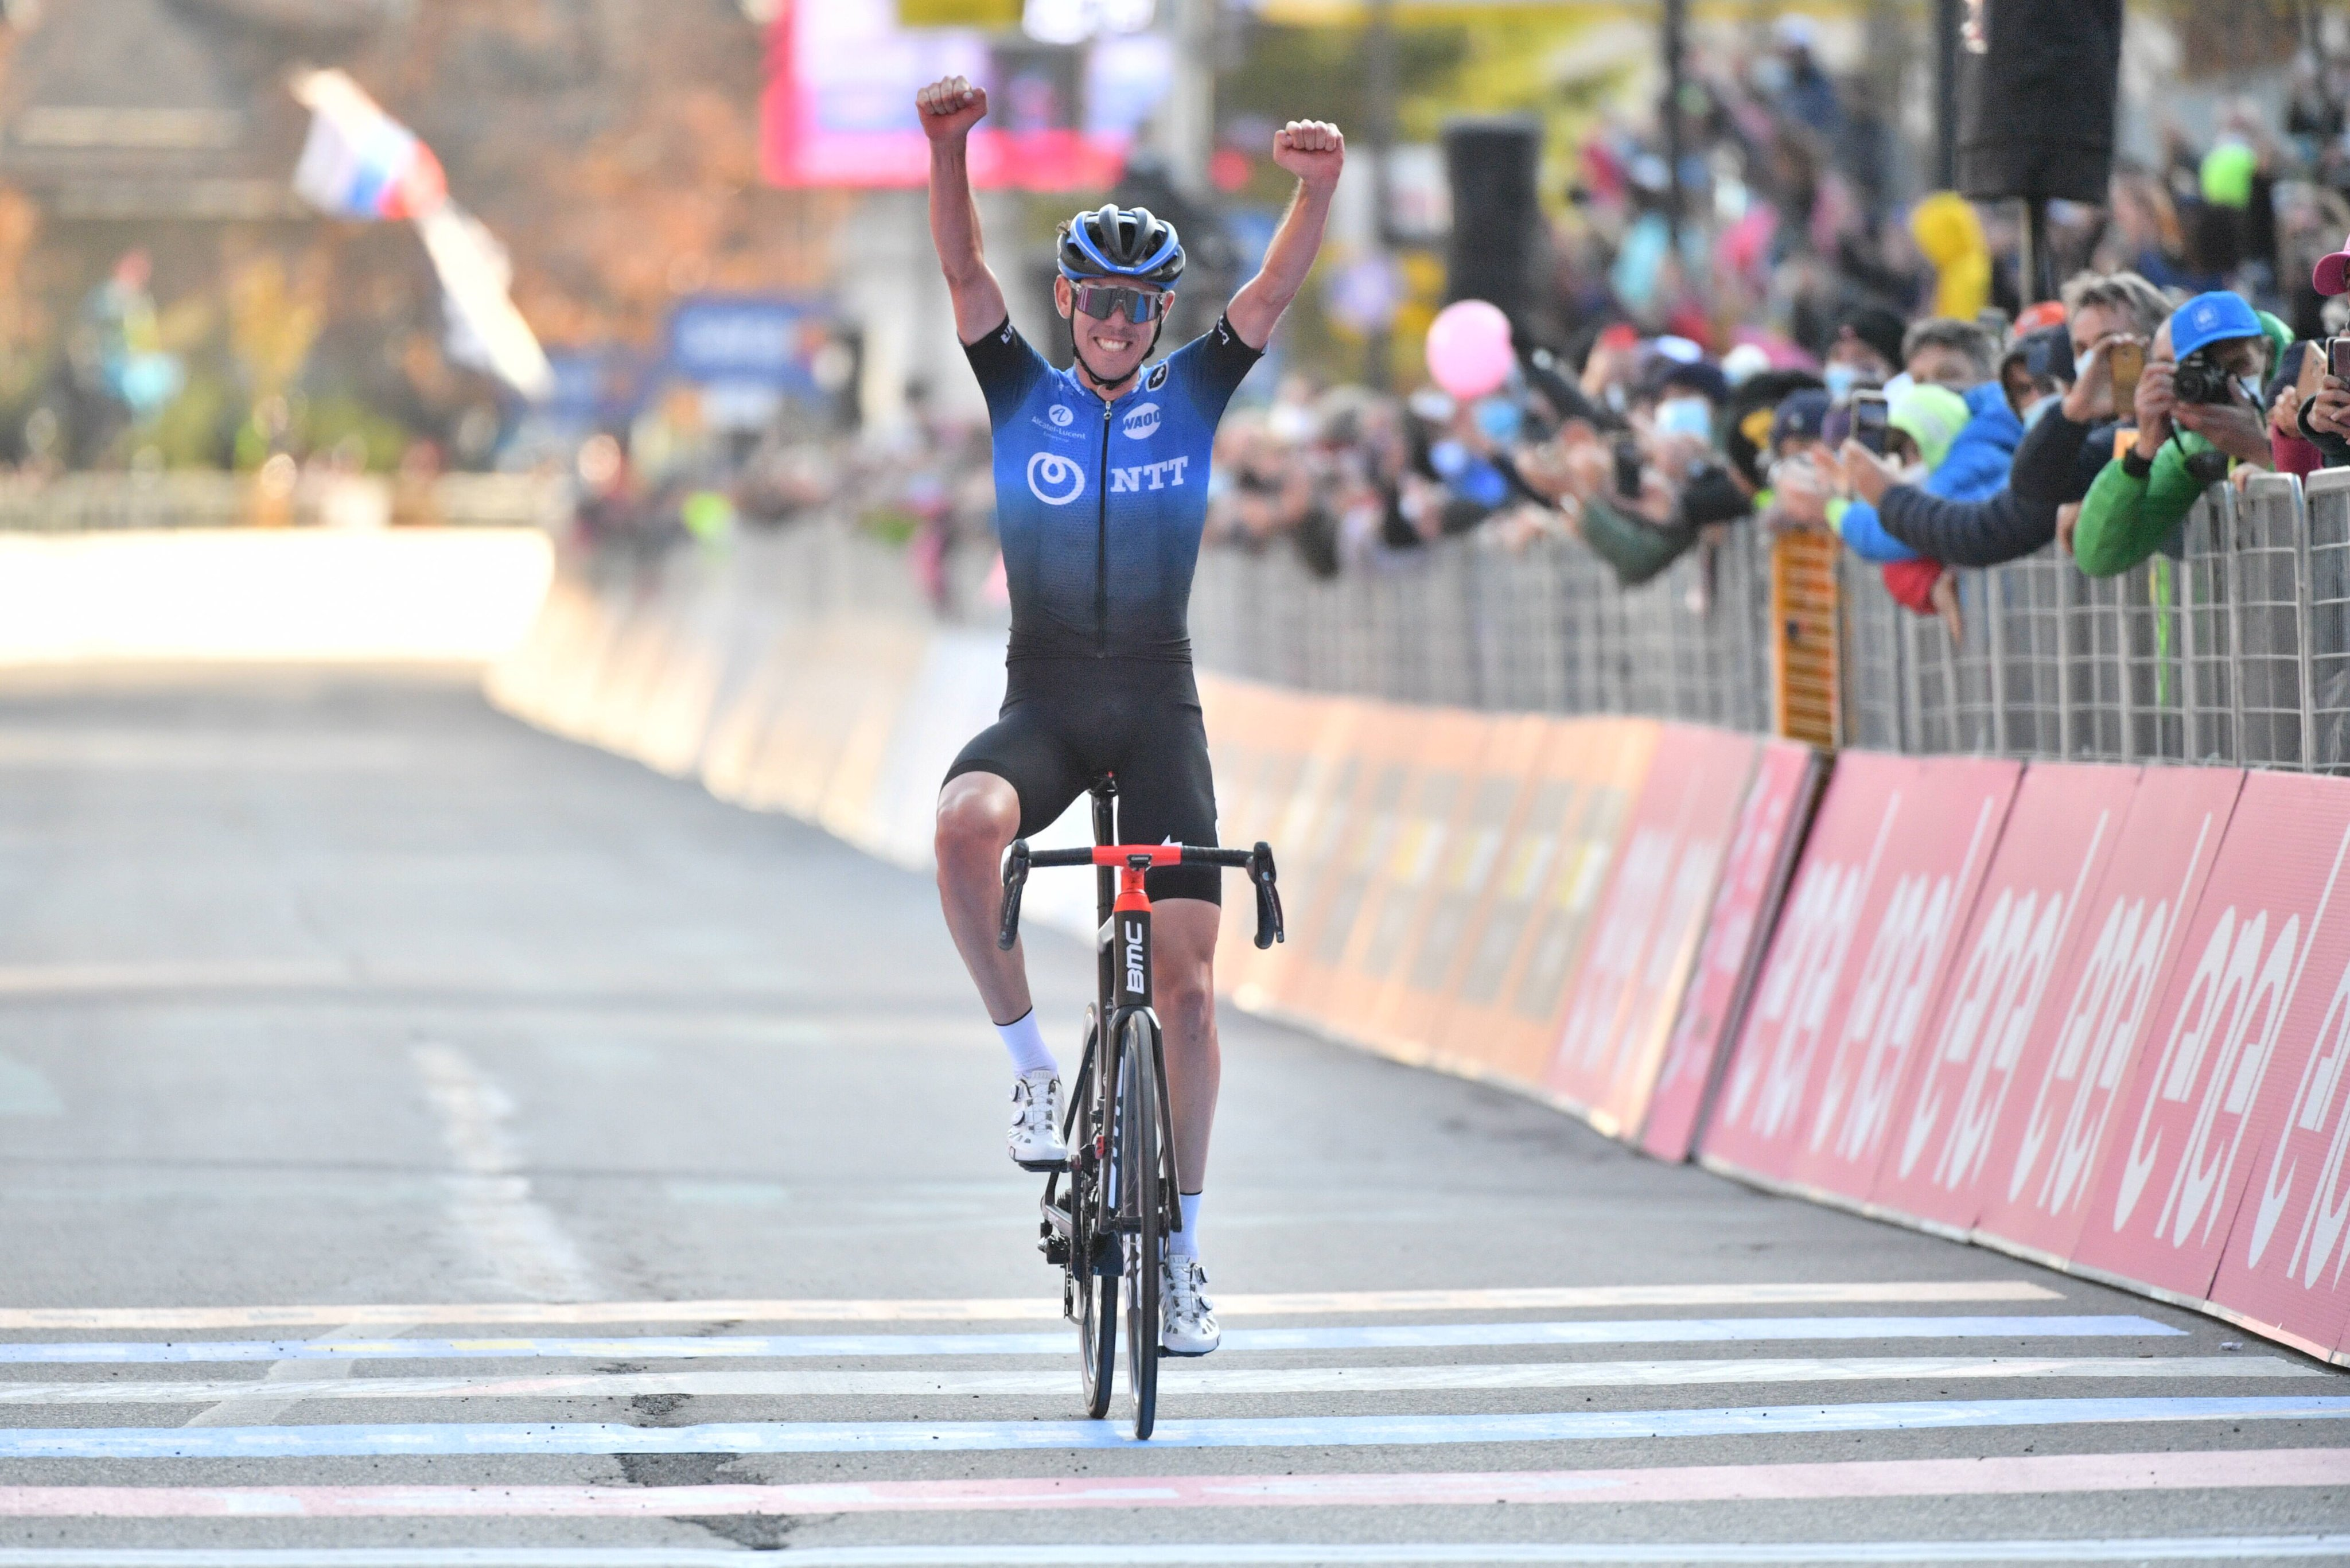 Ben O'Connor ganó la decimoséptima etapa del Giro de Italia 2020 (LaPresse).